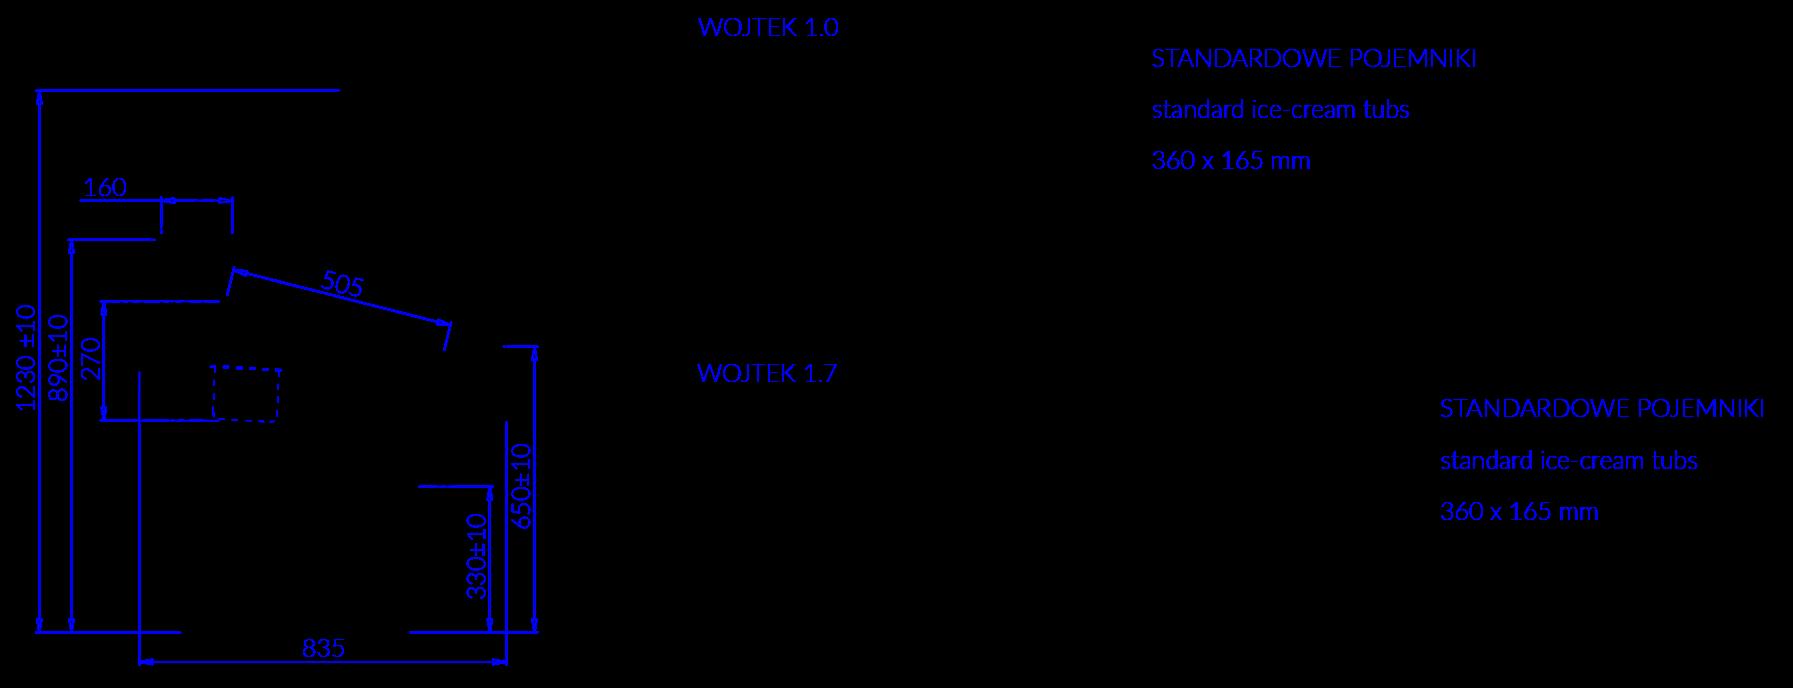 Technical drawing WOJTEK